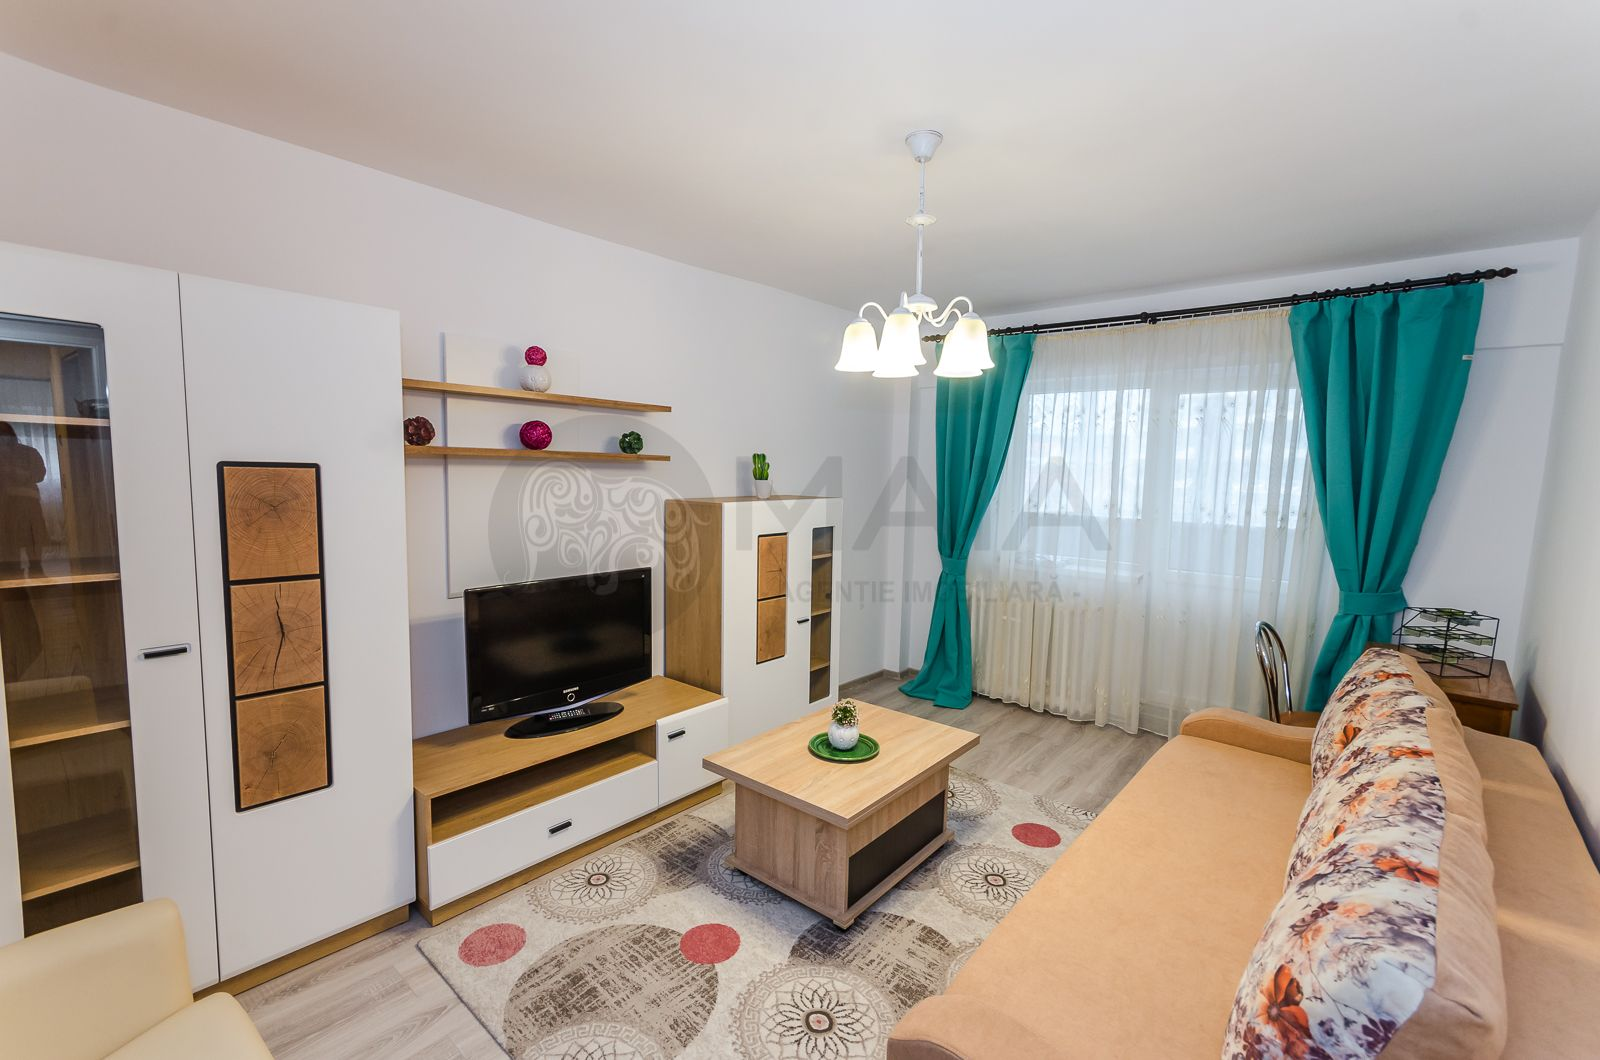 Apartament in zona centrala - Str Regele Ferdinand, complet renovat